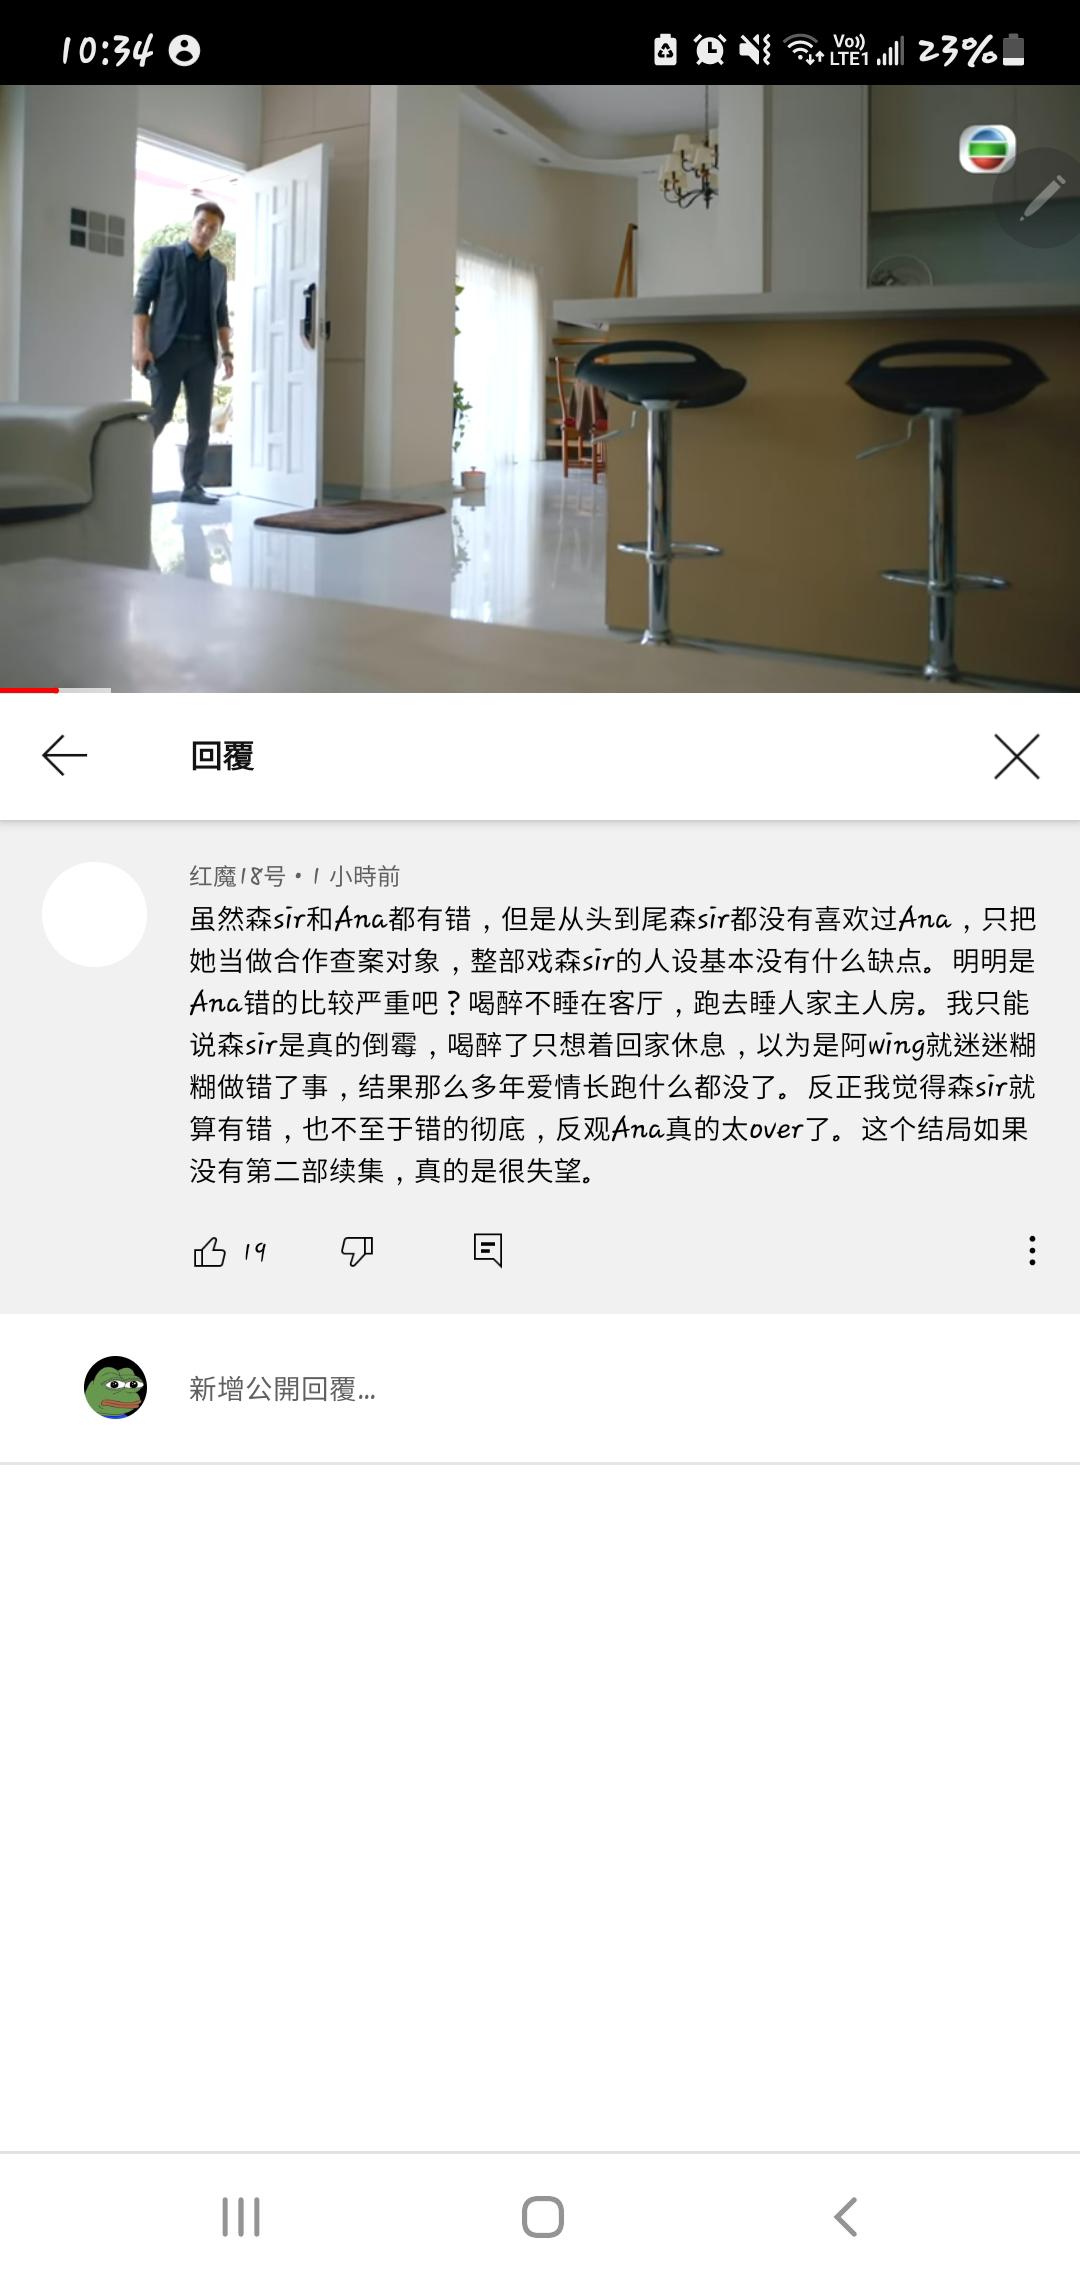 https://upload.hkgolden.media/comment/ob0oldw5.zts3m3frlhl.45ppu5am3qr.2mv.jpg